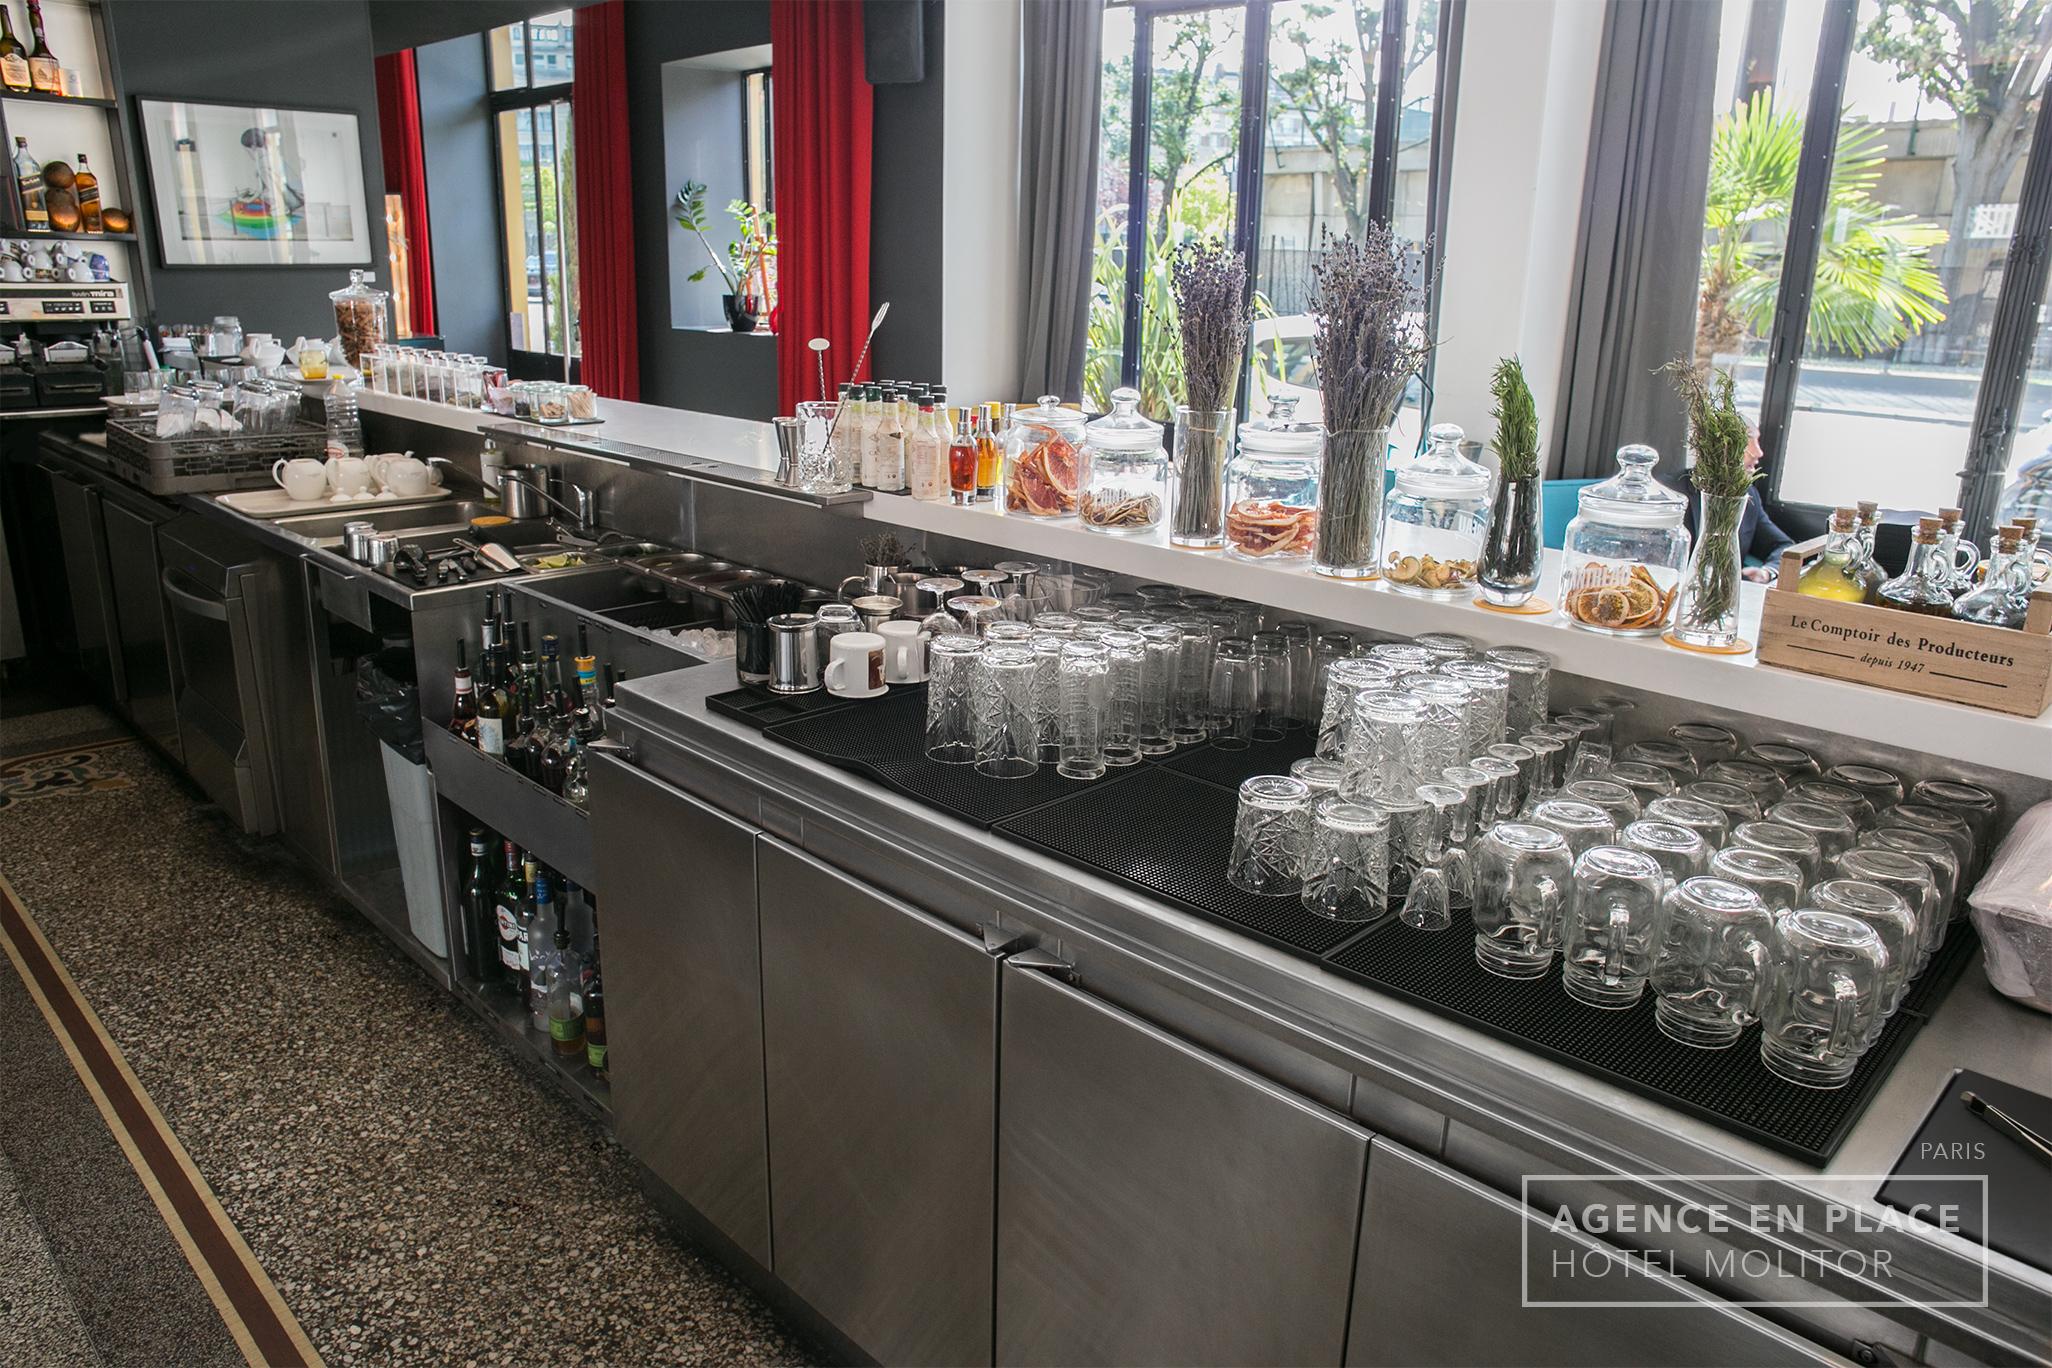 hotelmolitor-agenceenplace-cocktailsbar005